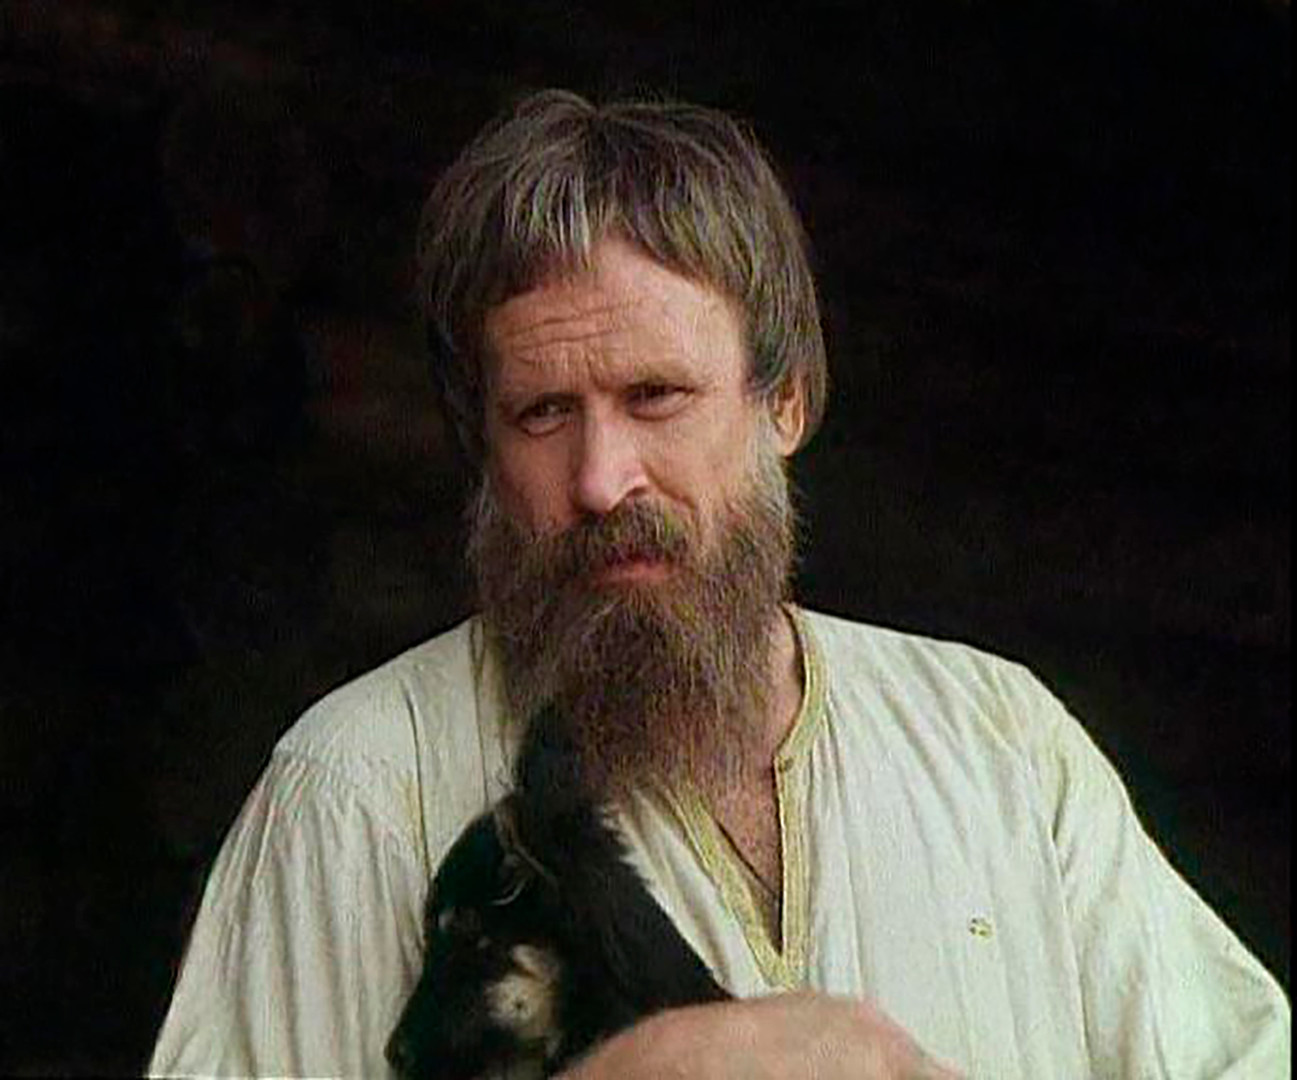 Bojar Stepan Kutschka (Film Juri Dolgoruki aus dem Jahr 1998)